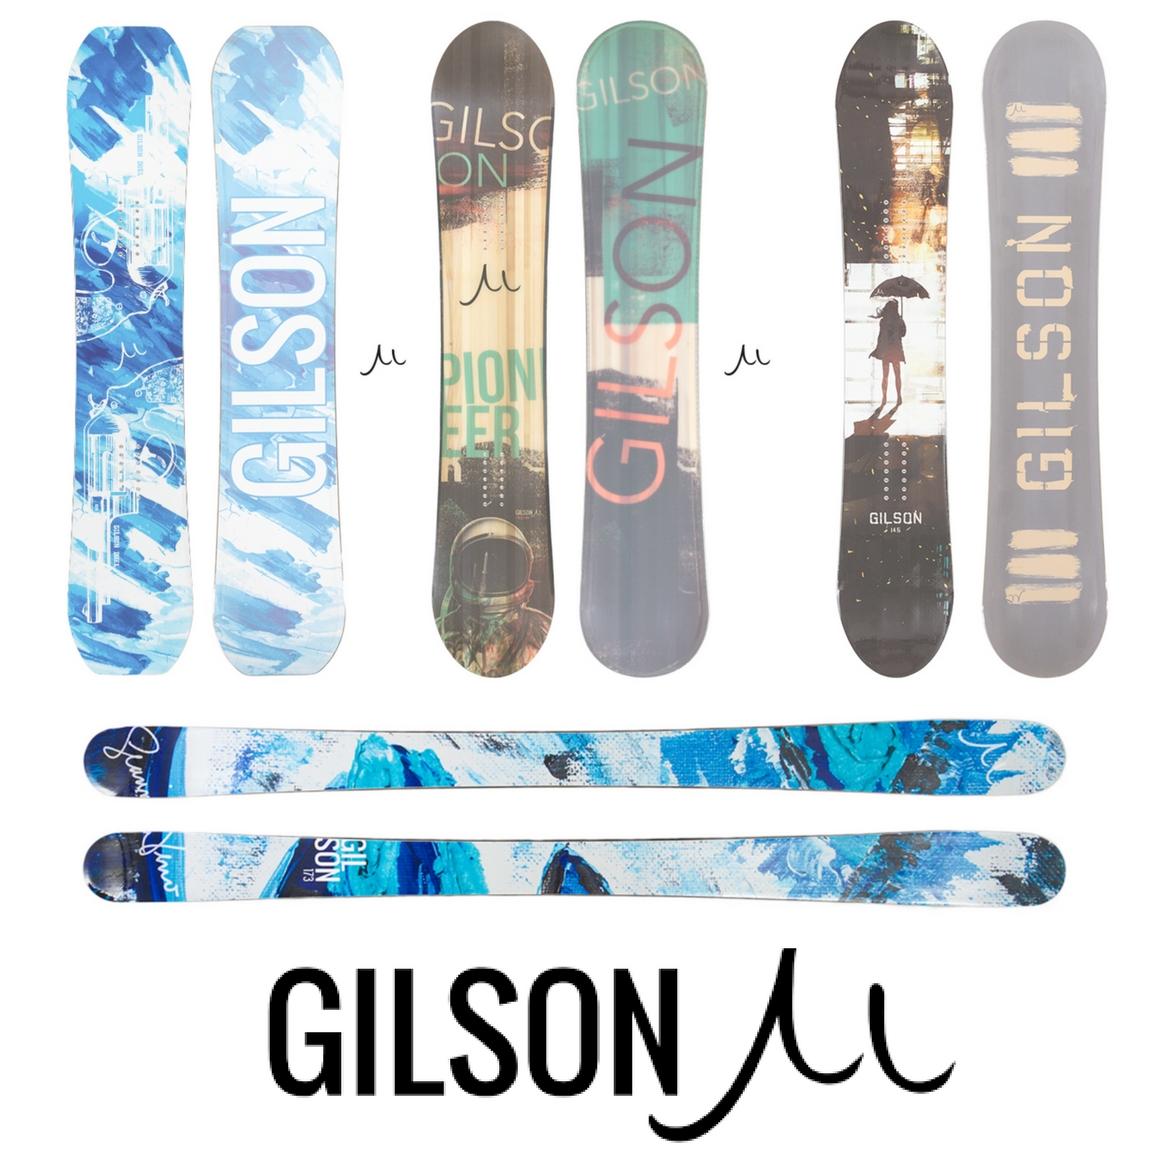 Gilson Snow Brand image.jpg